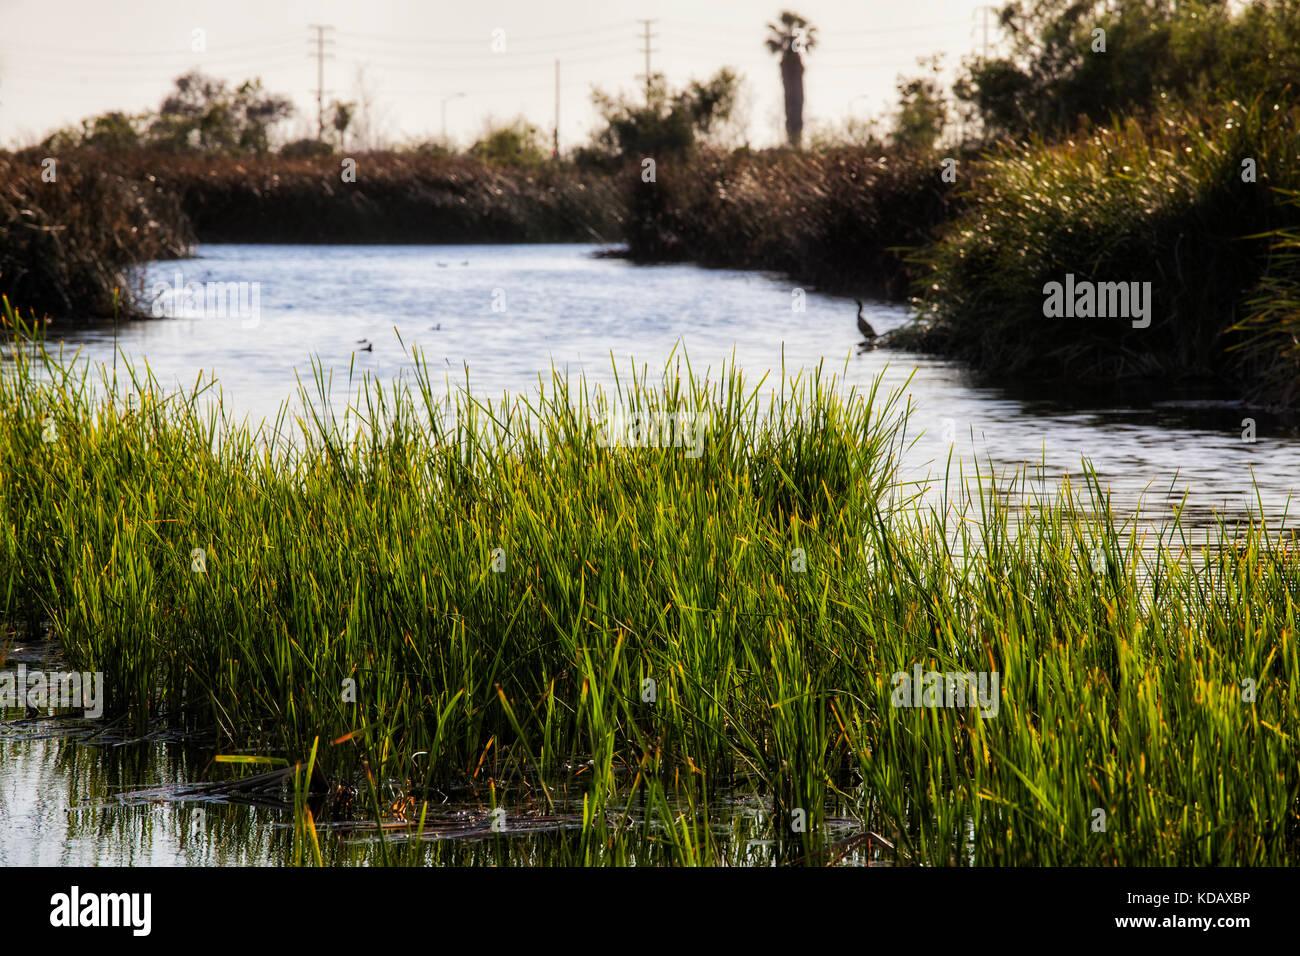 Zone umide ballona riserva ecologica, playa vista, Los Angeles, california, Stati Uniti d'America Foto Stock